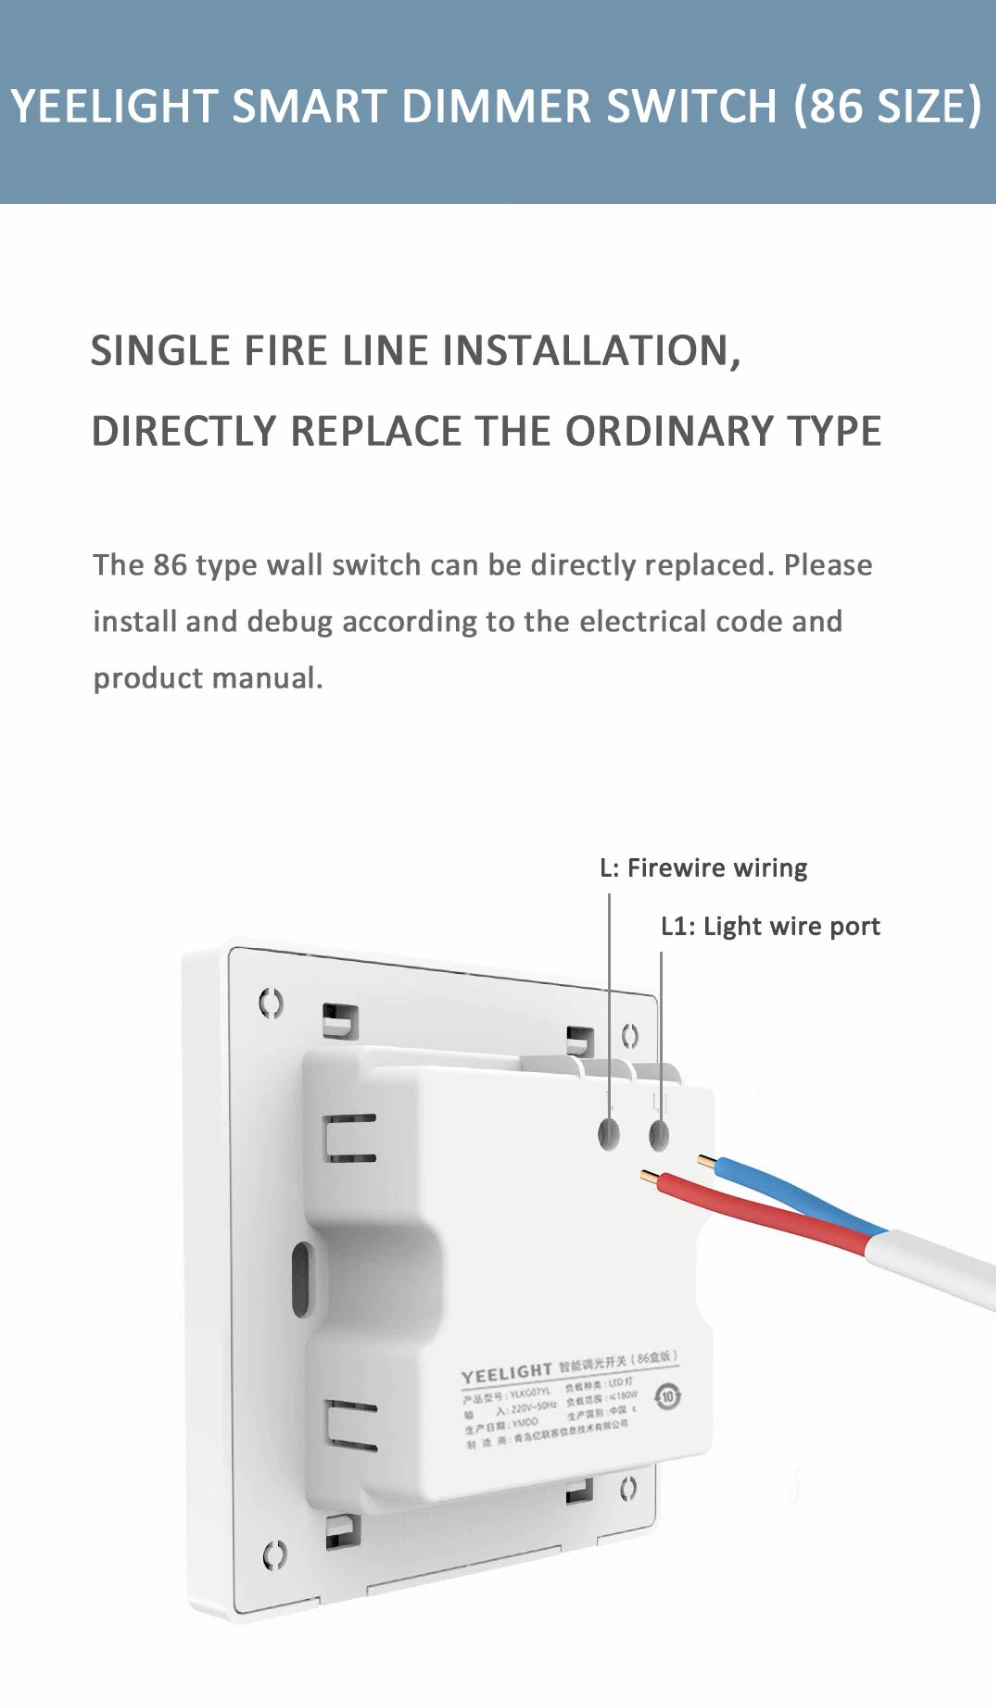 Xiaomi Yeelight Smart Dimmer Switch: Instalación